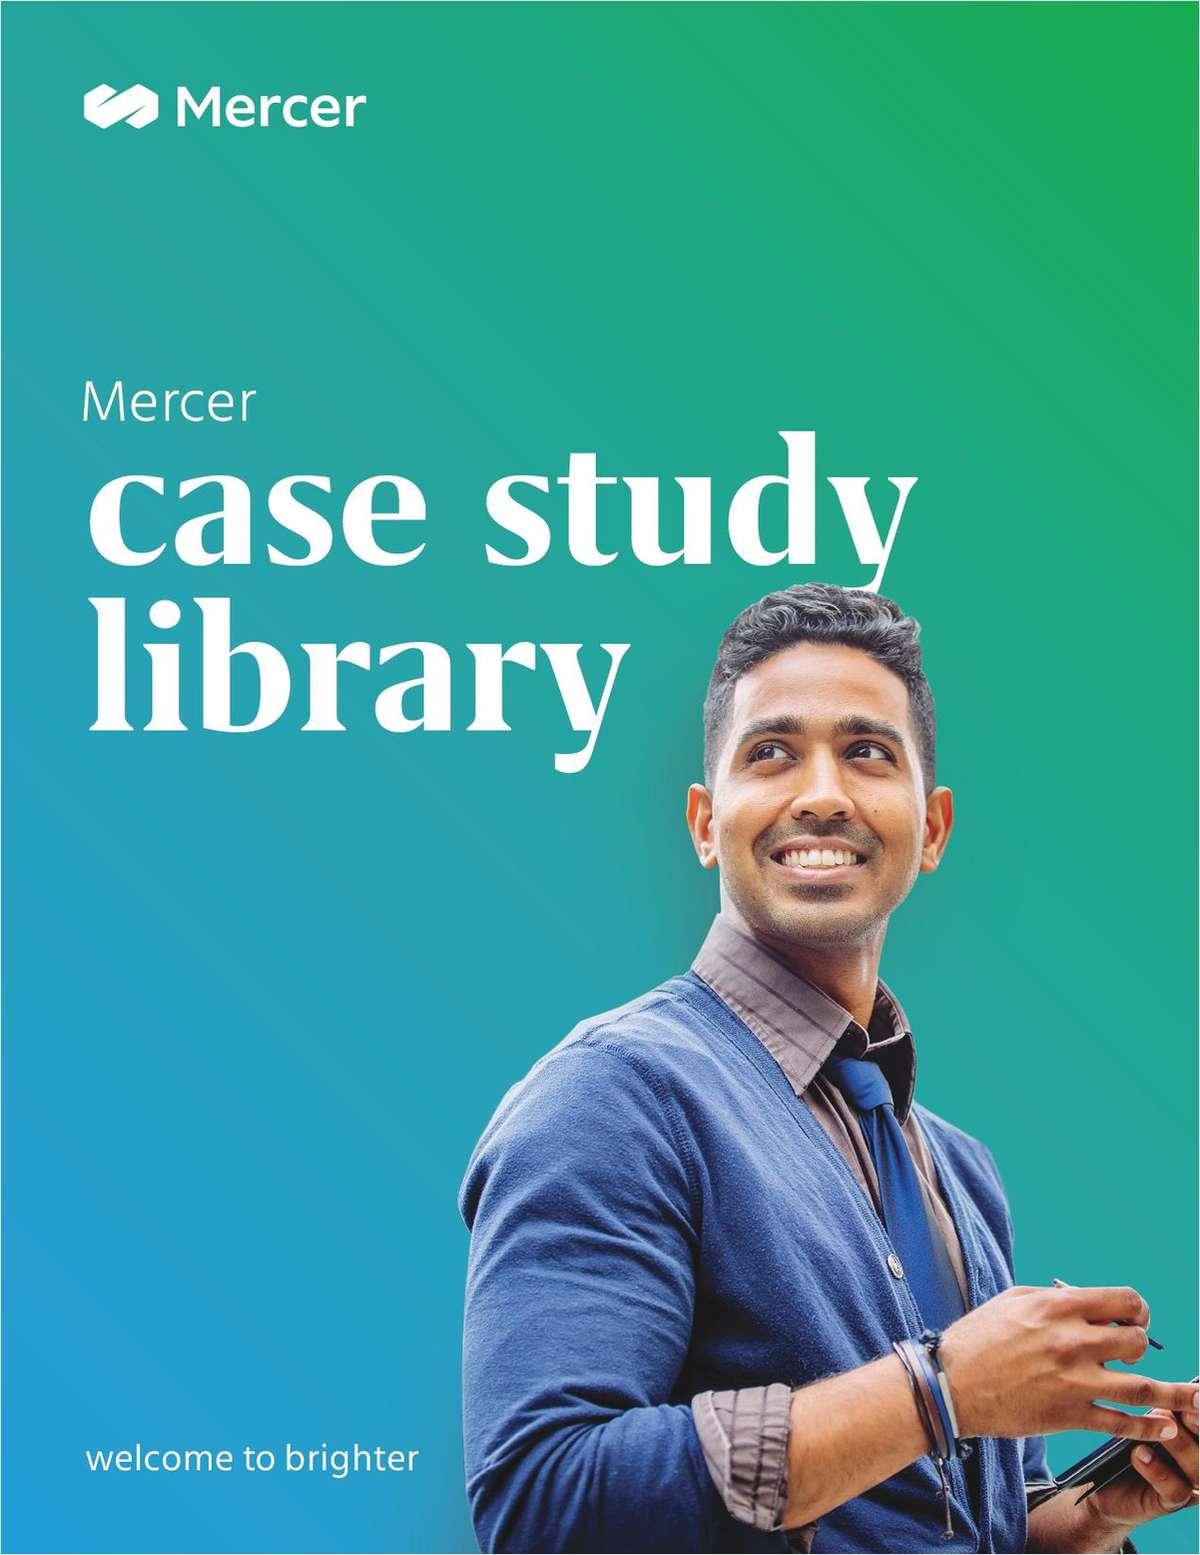 Mercer Case Study Library